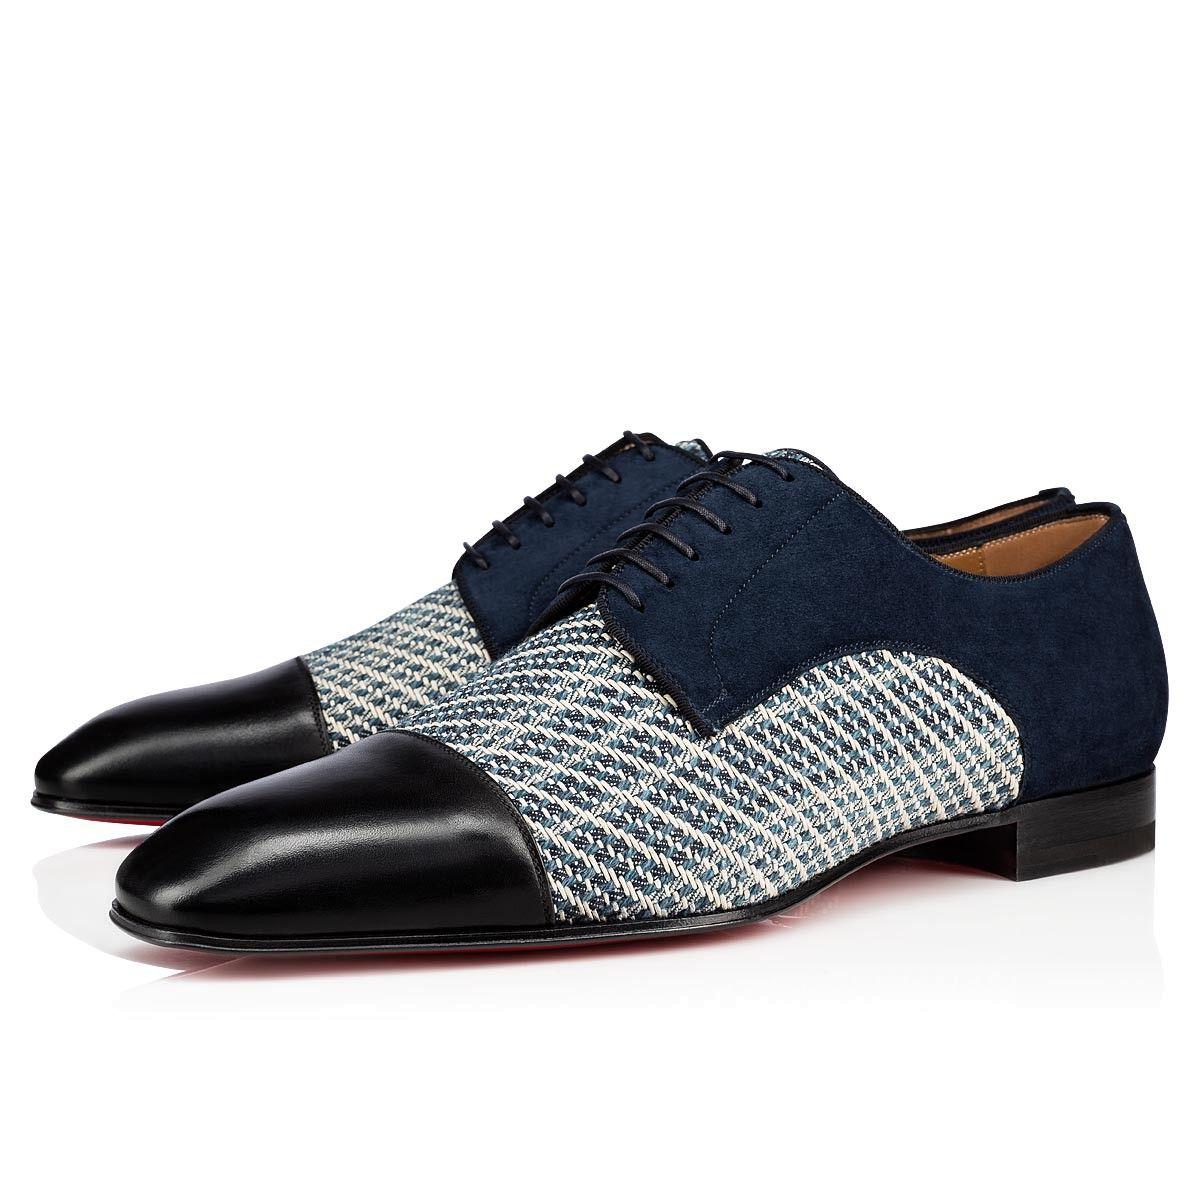 Mens Louboutin Dress Shoes